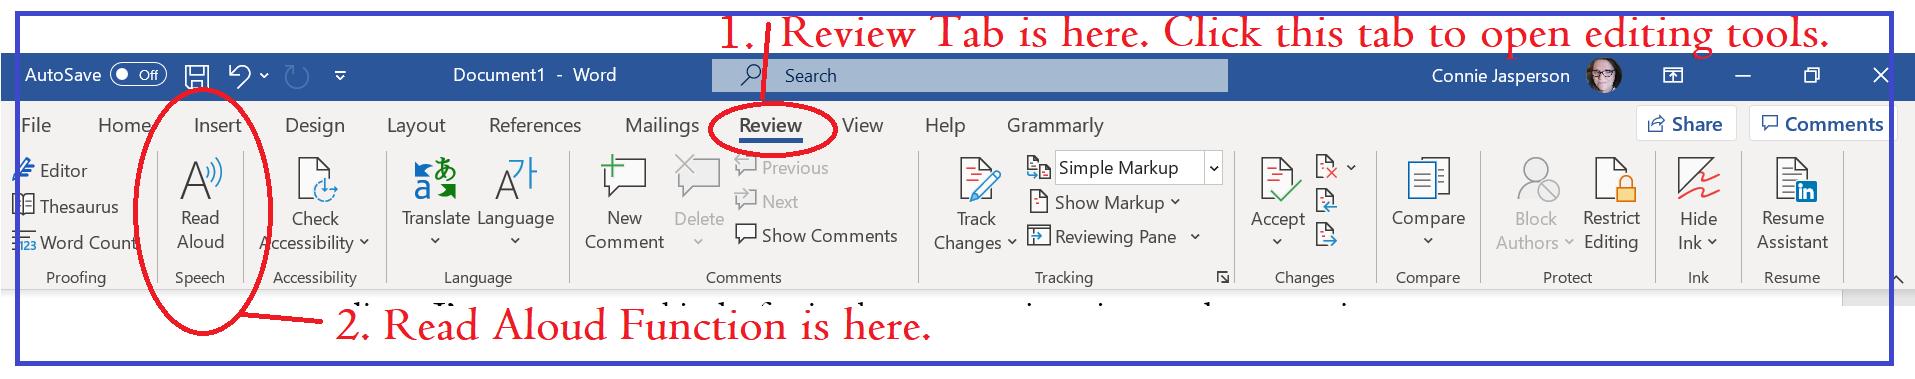 ReviewTabLIRF07032021